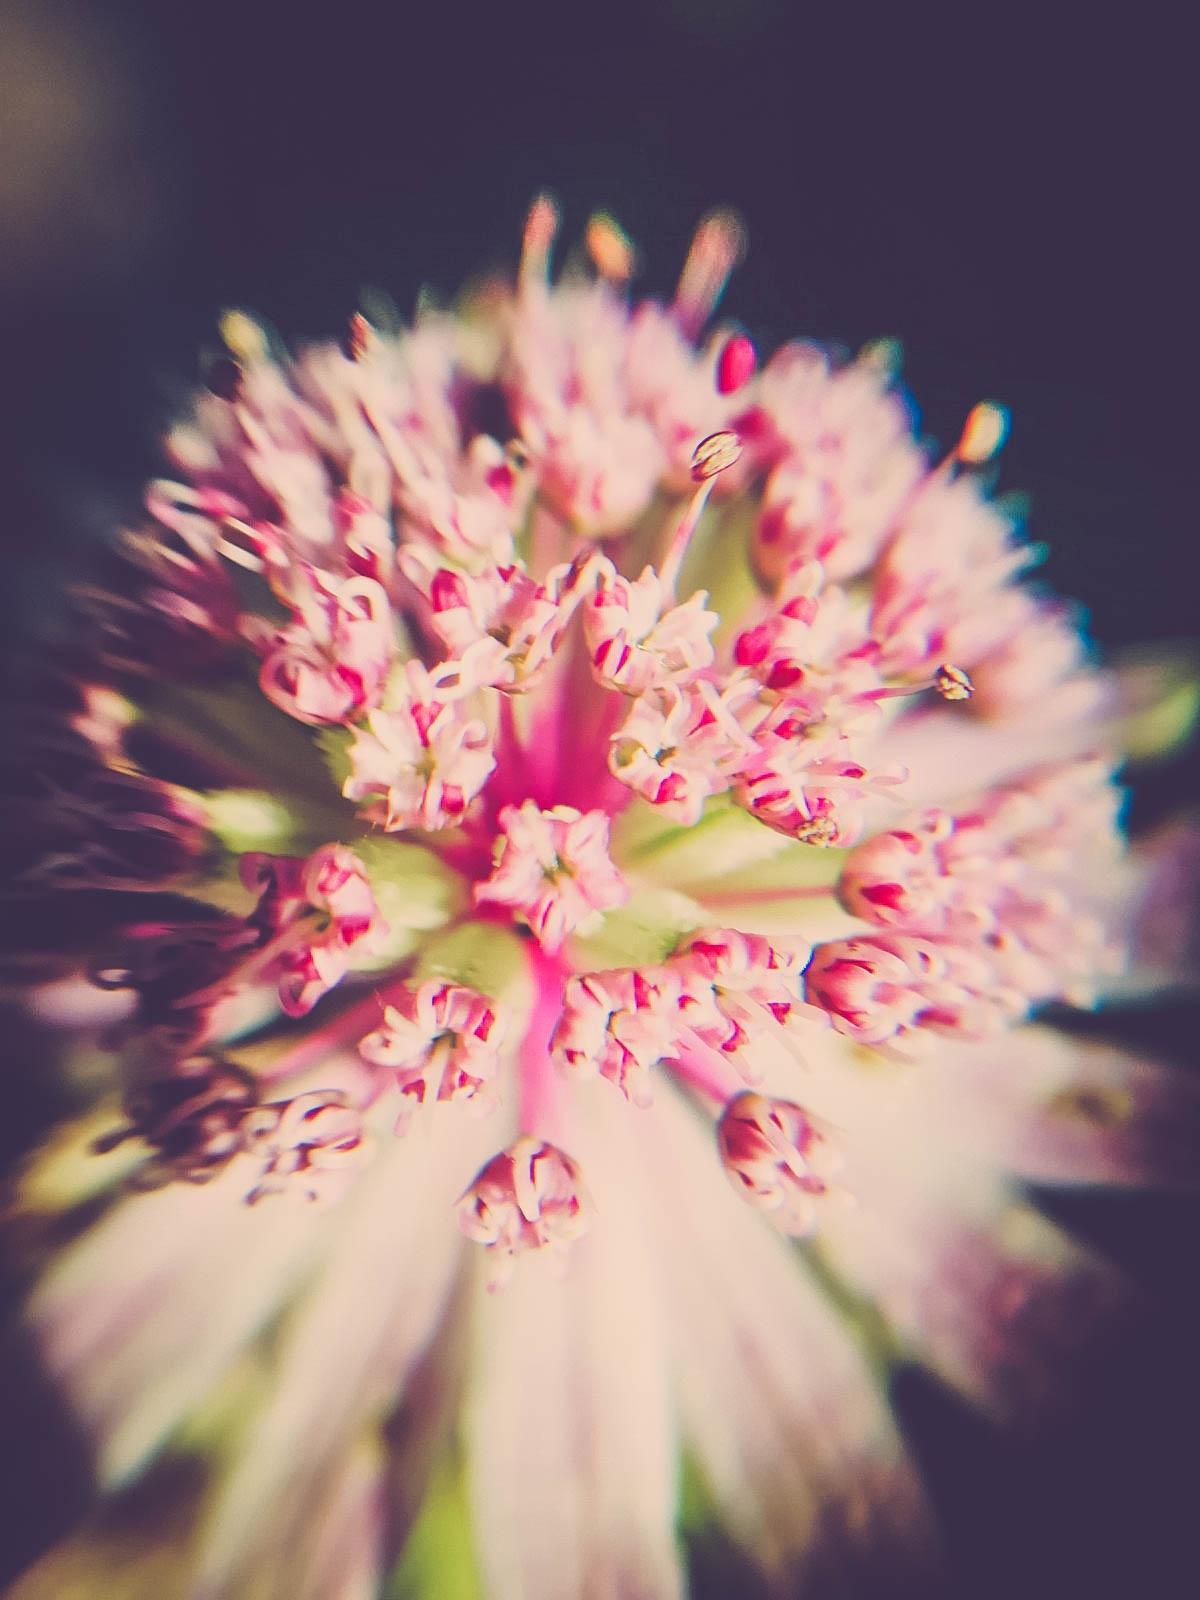 Autumn Bouquet by antonia kofod